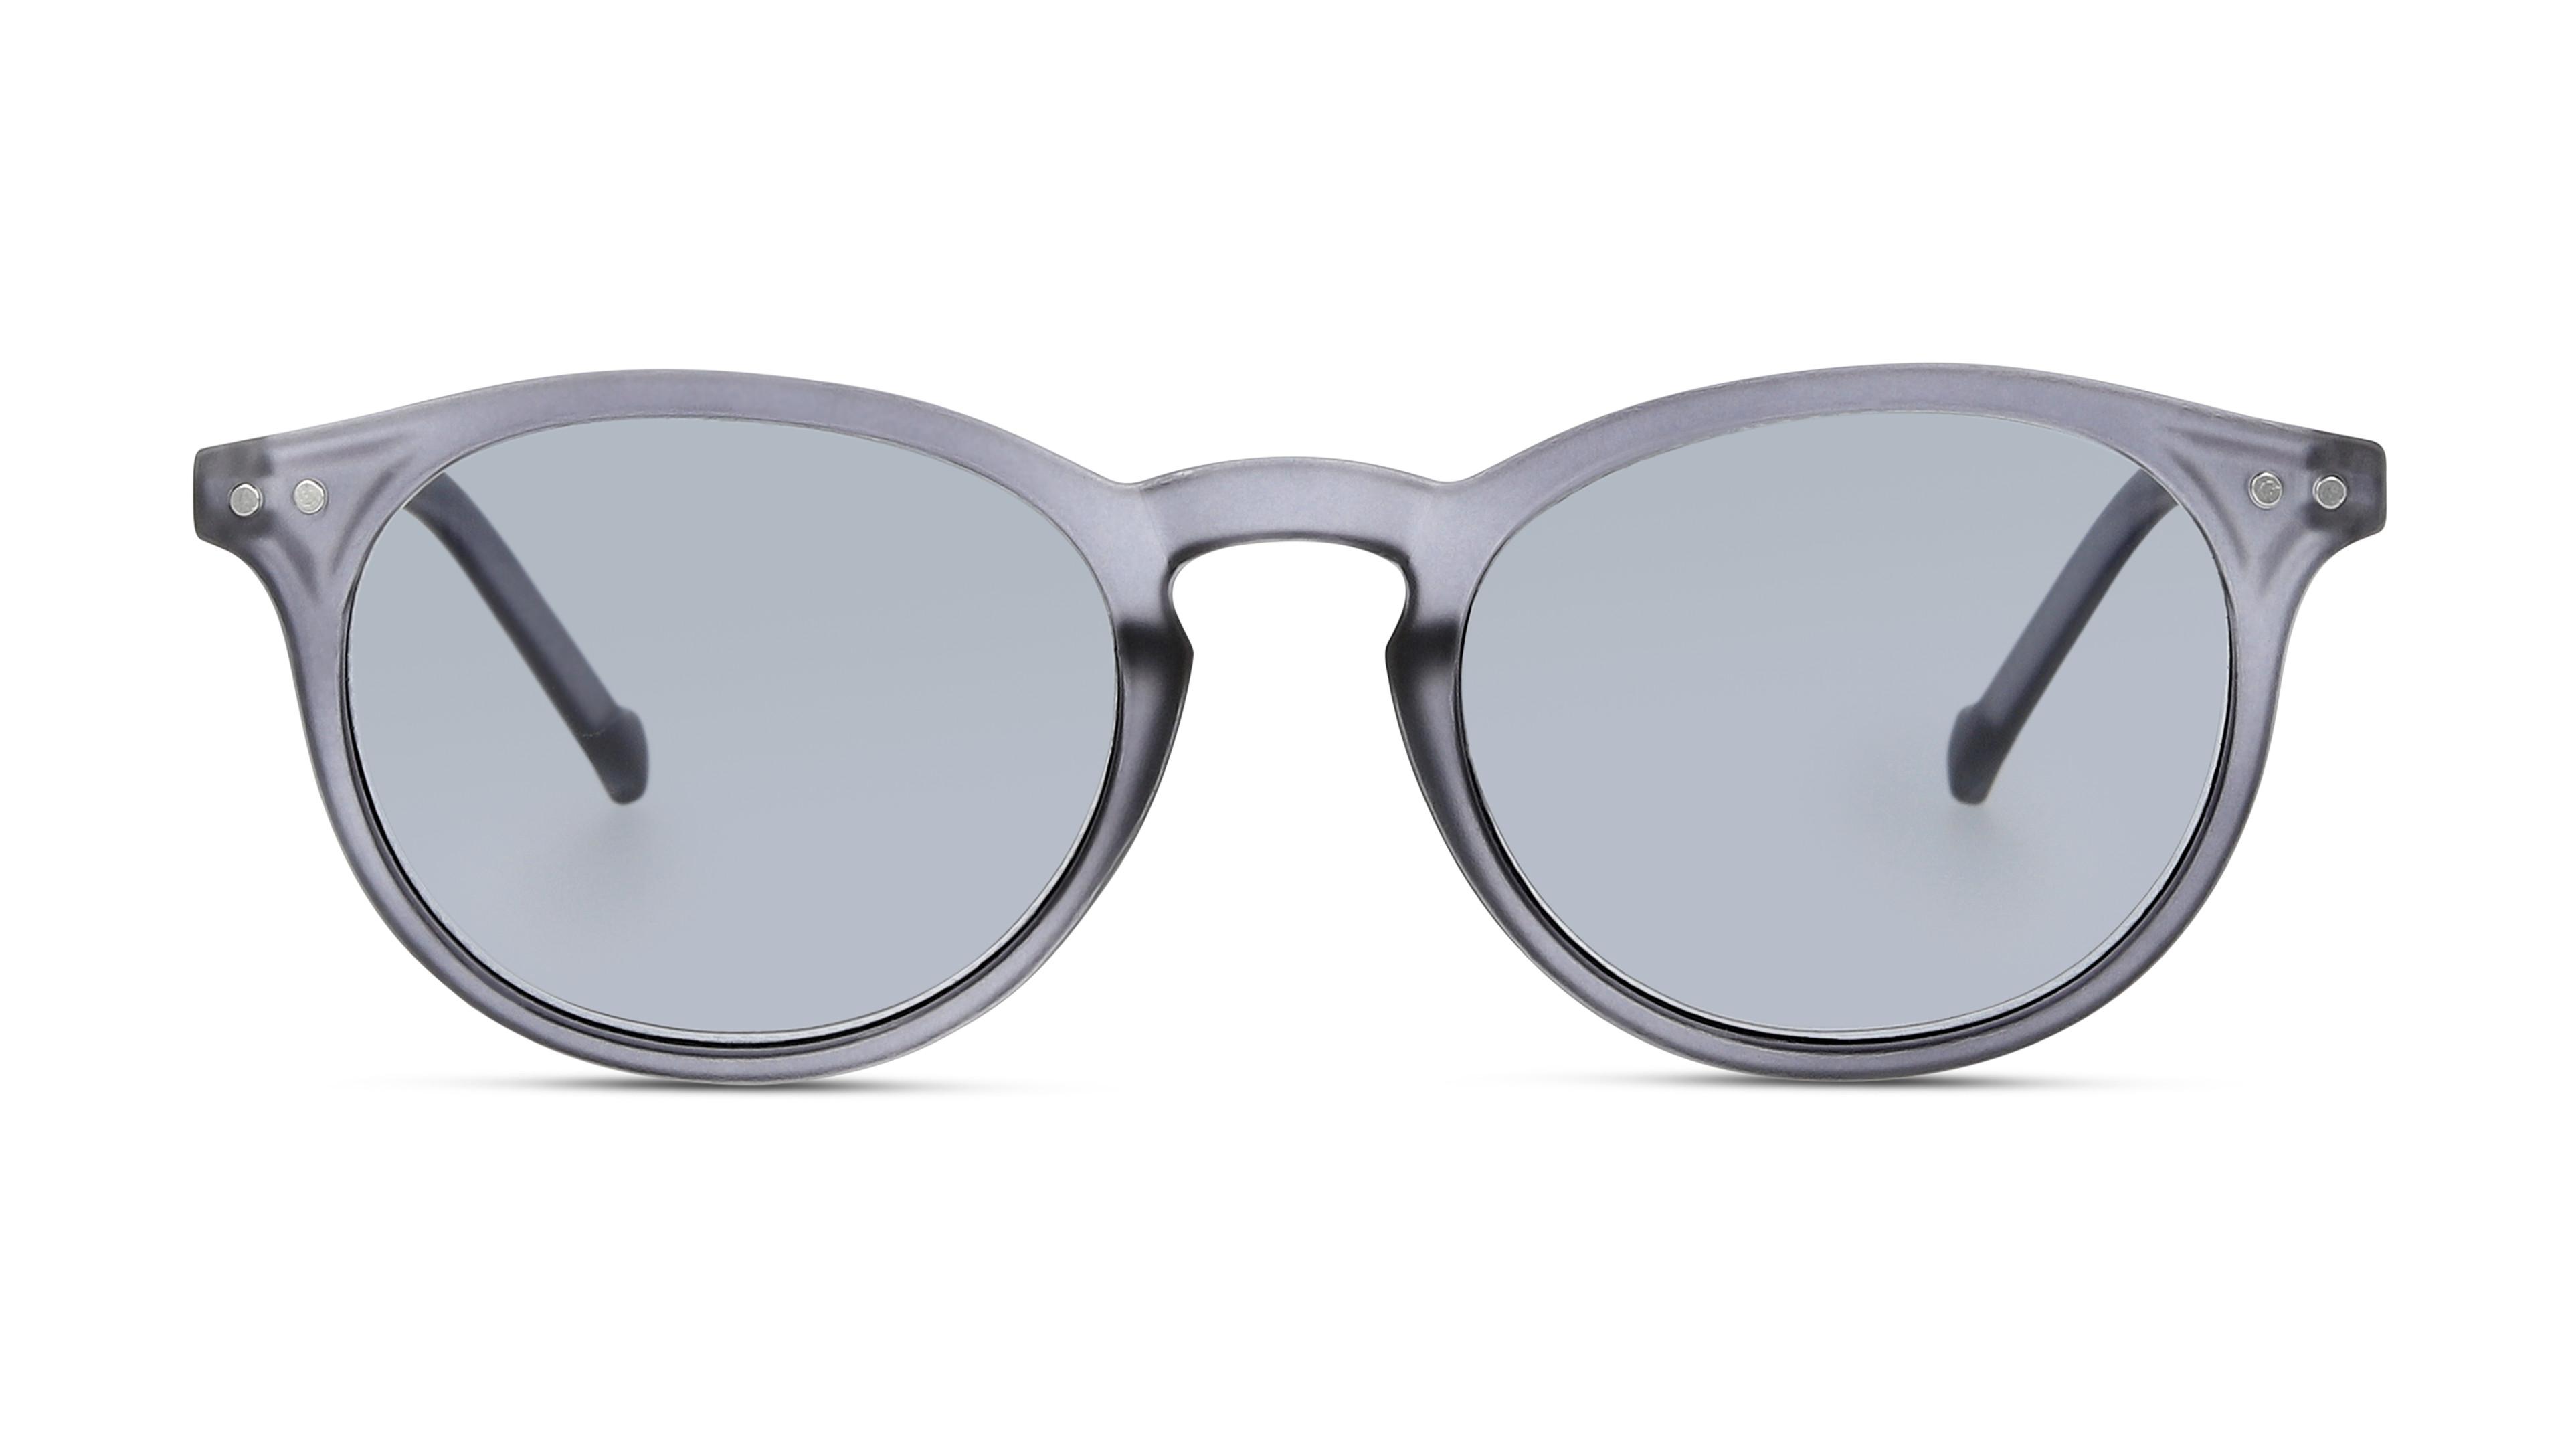 8719154759147-front-01-gv-srlu08-eyewear-grey-grey